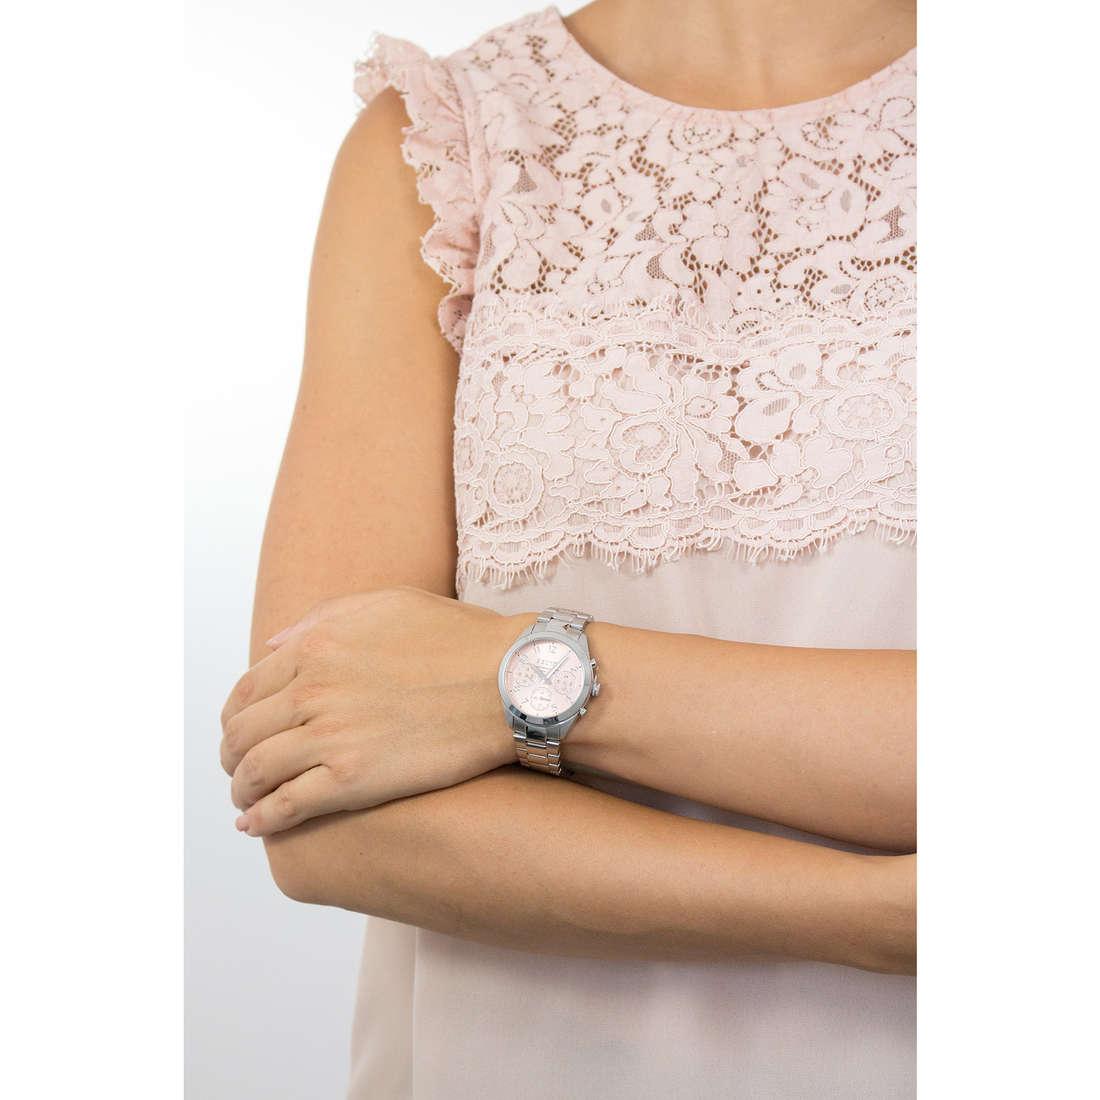 Sector cronografi 120 donna R3253588503 indosso